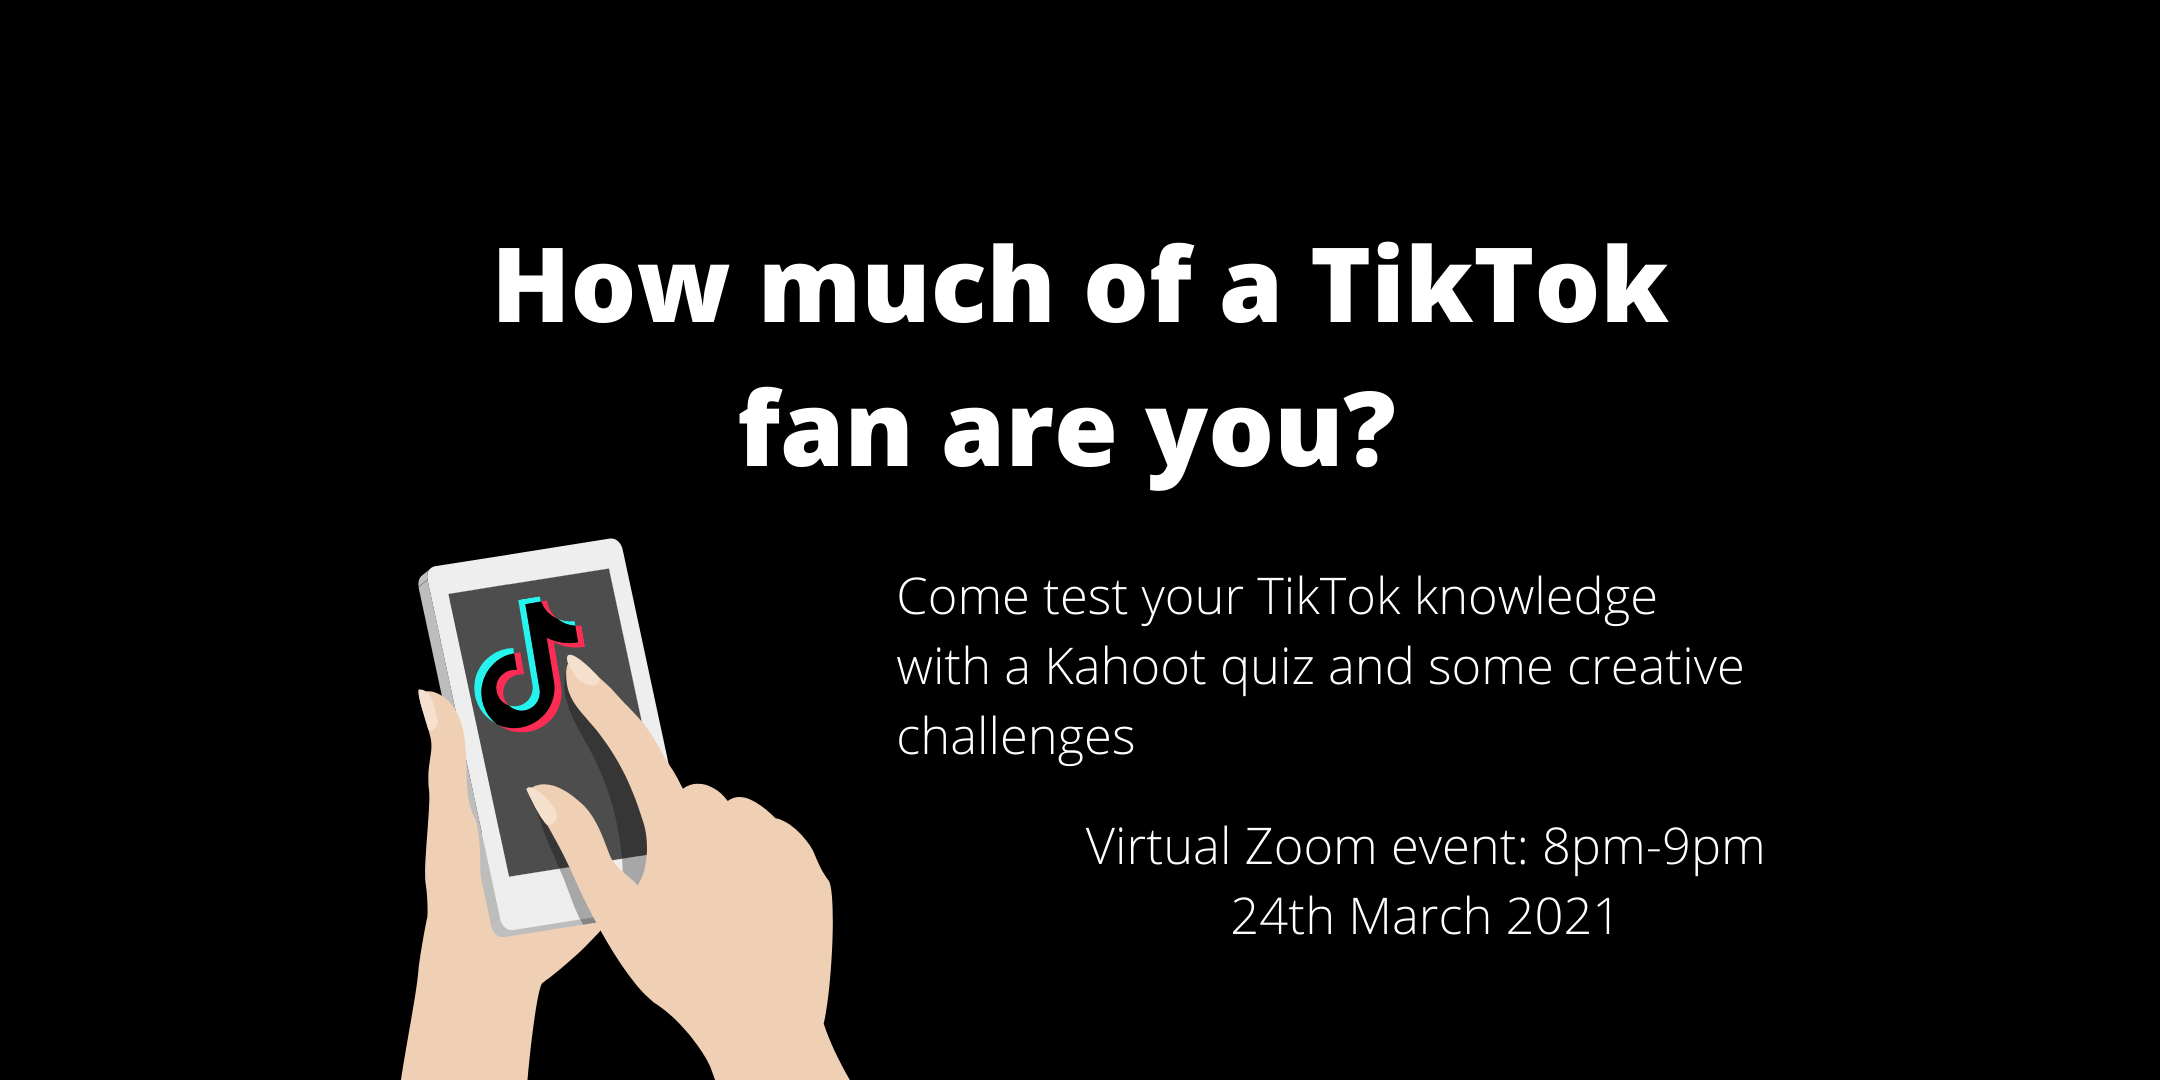 Mobile phone with TikTok icon